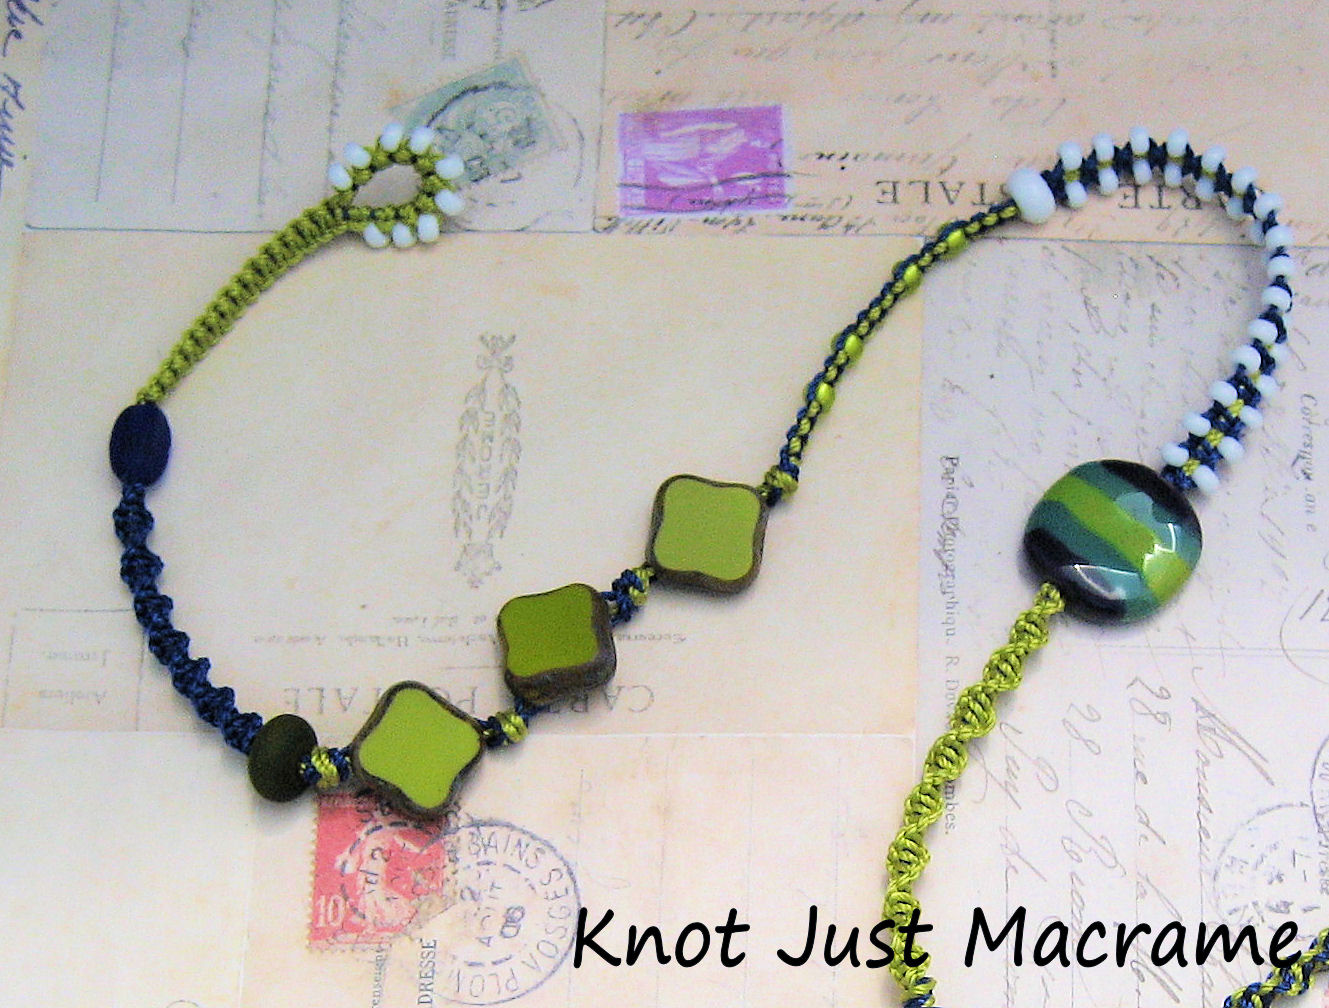 Knot Just Macrame By Sherri Stokey Multi Wrap Macrame Bracelet Tutorial